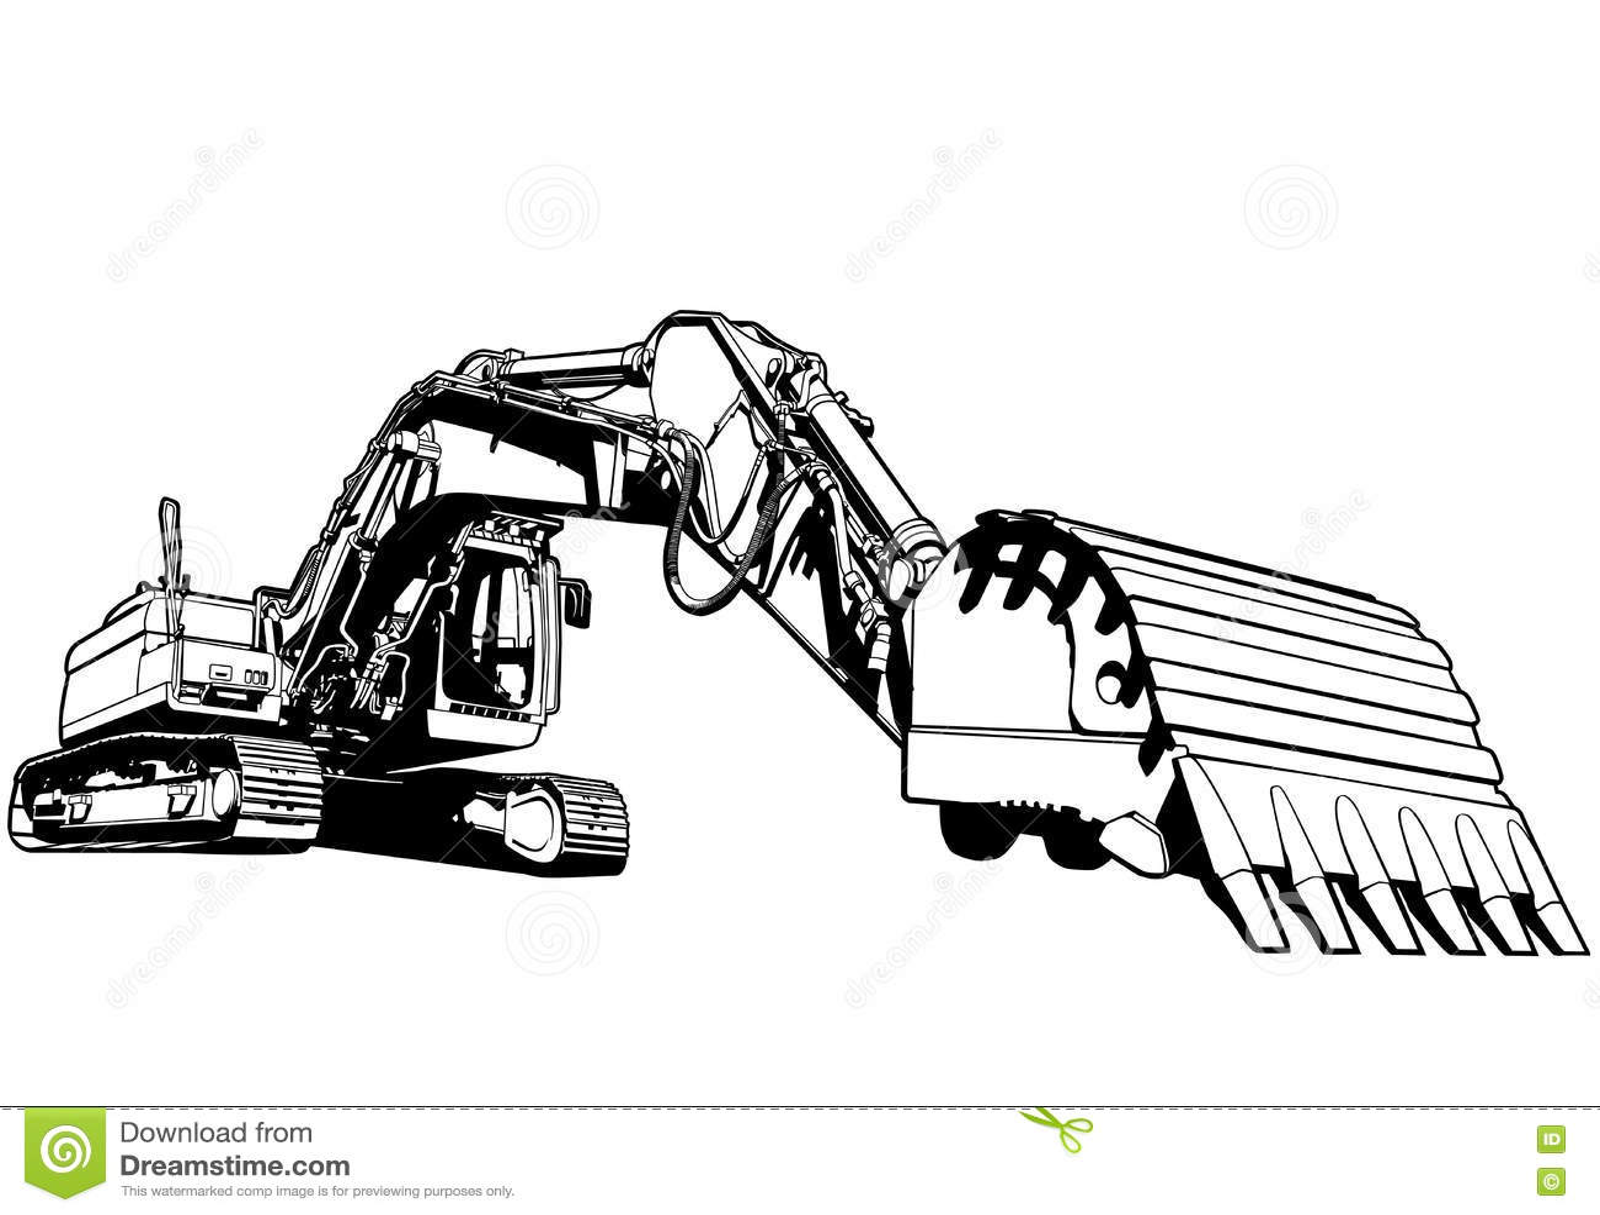 Excavator Illustration Stock Vector Illustration Of